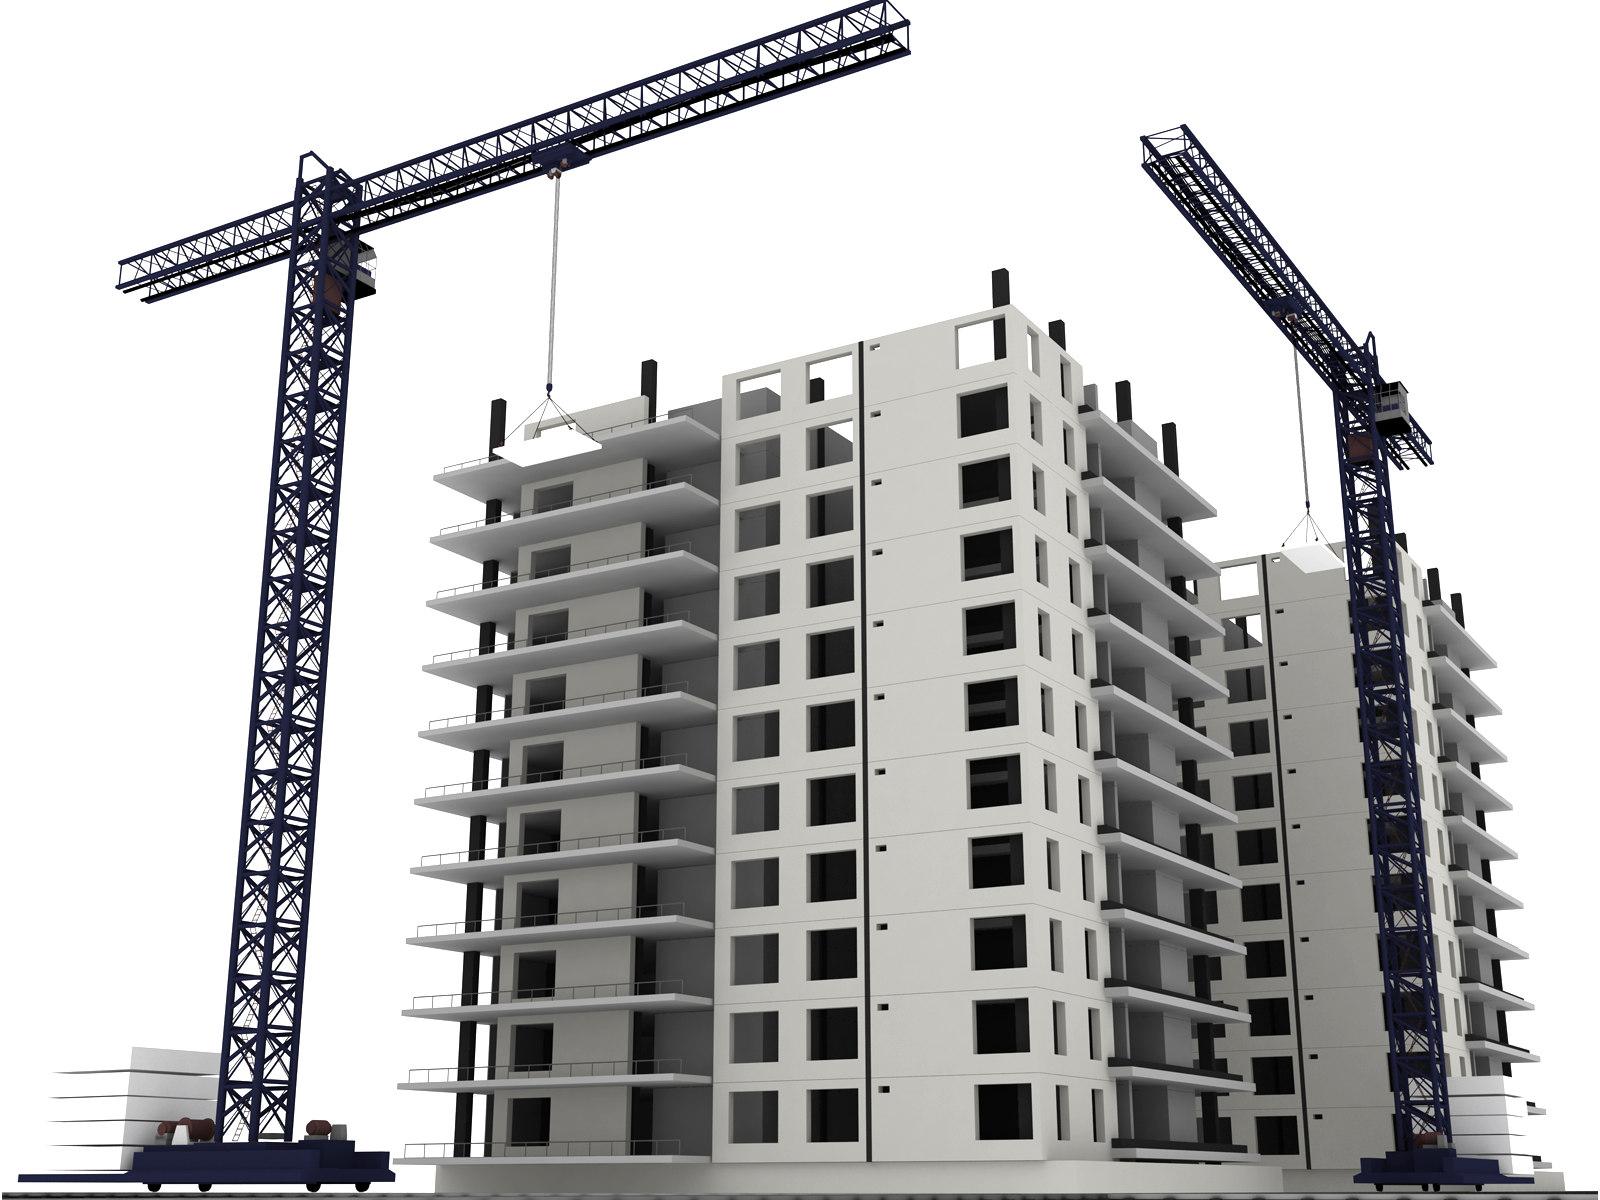 Welcome to 3D Cad Models: 3d Buildings - En Construction